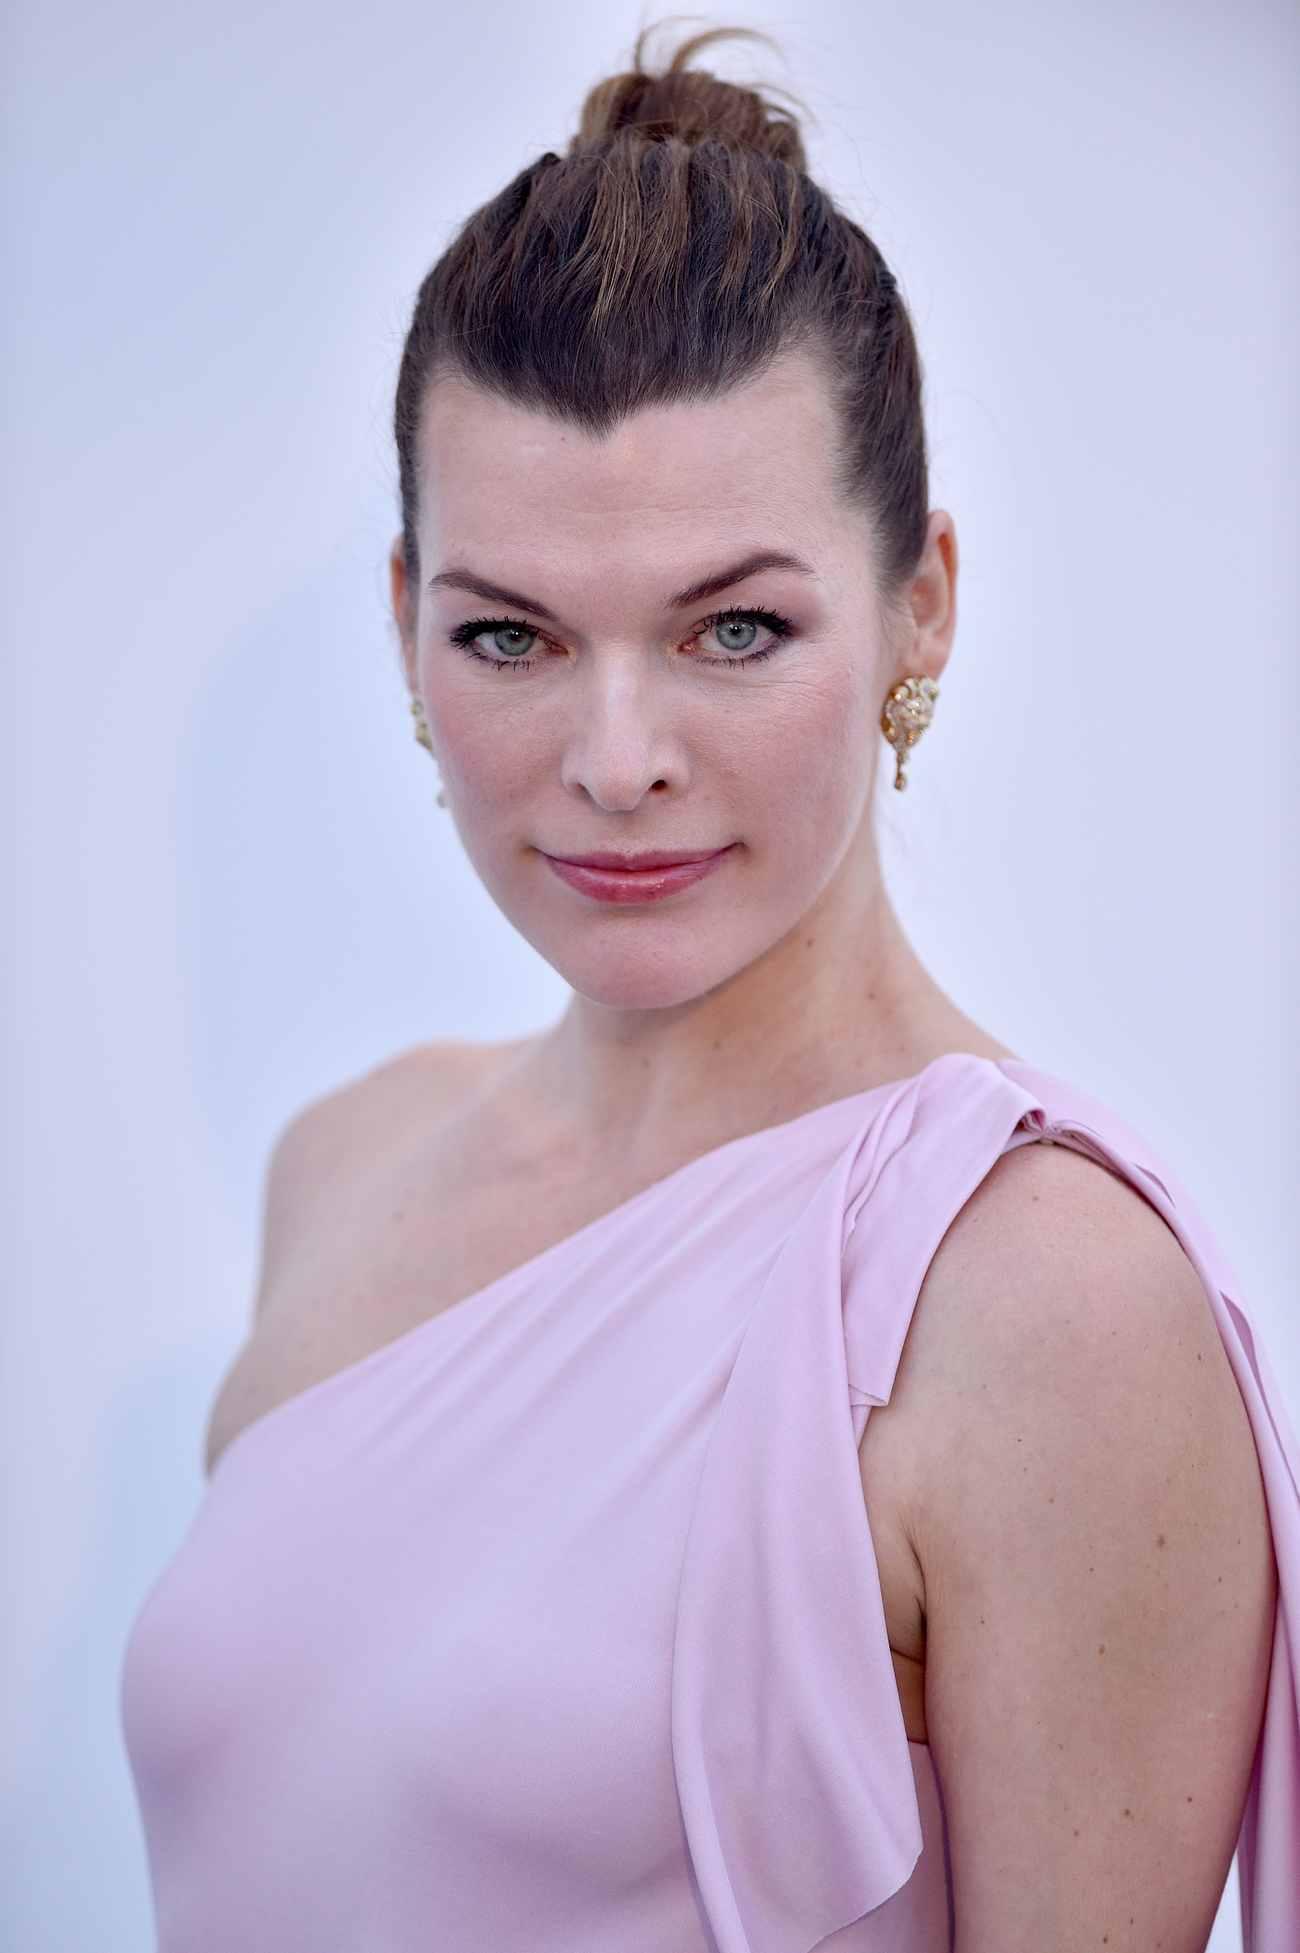 Milla-Jovovich-amfAR-Gala-during-the-71st-Annual-Cannes-Film-Festival-May-1700003.jpg